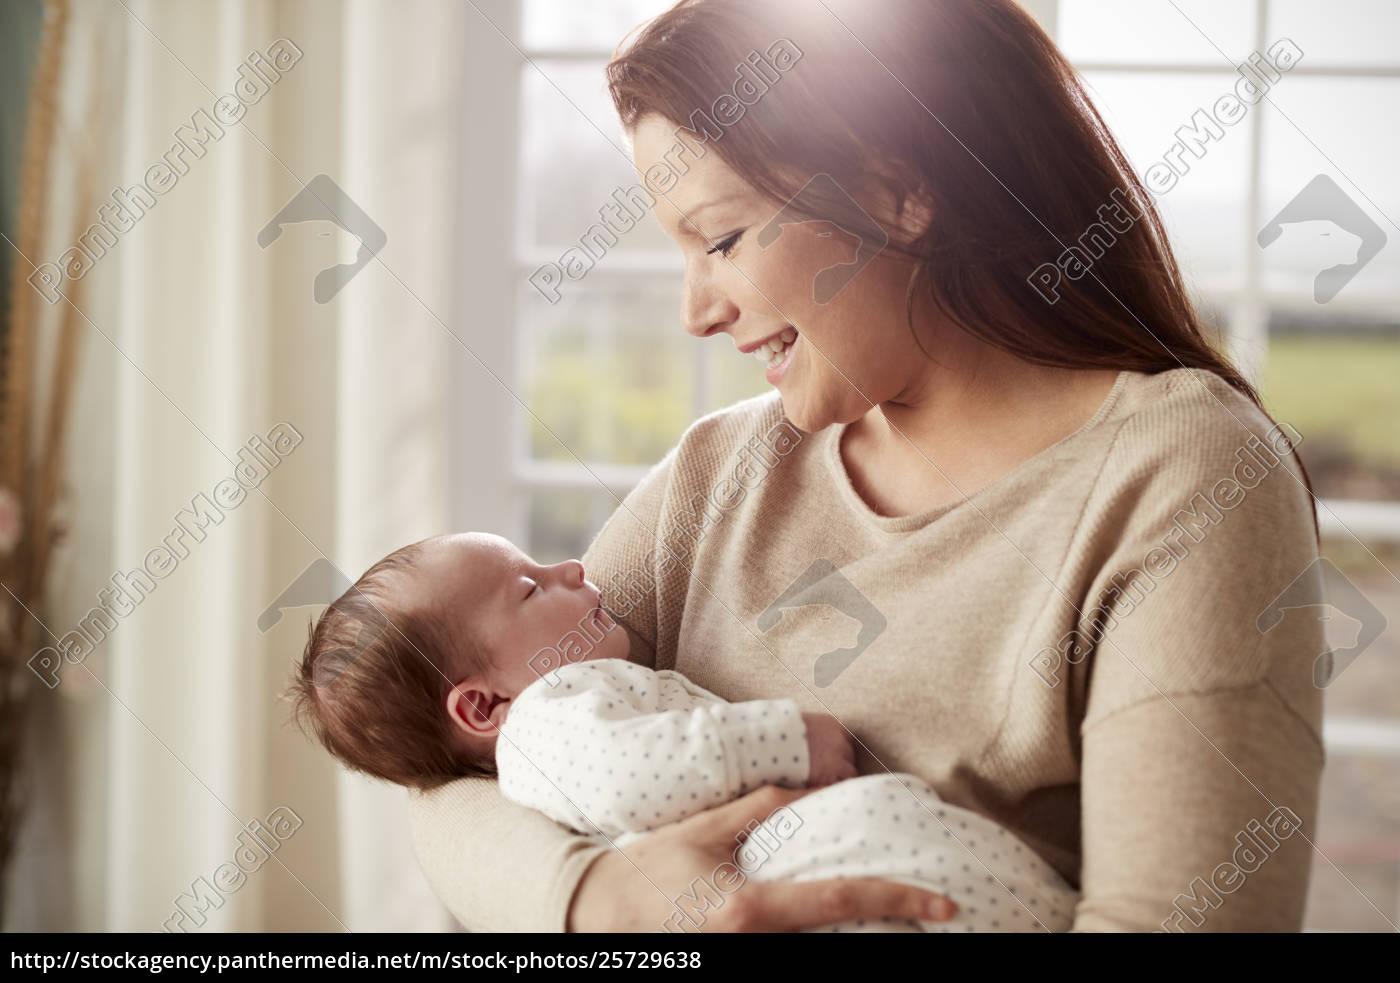 Loving mother cuddling newborn baby at 25729638